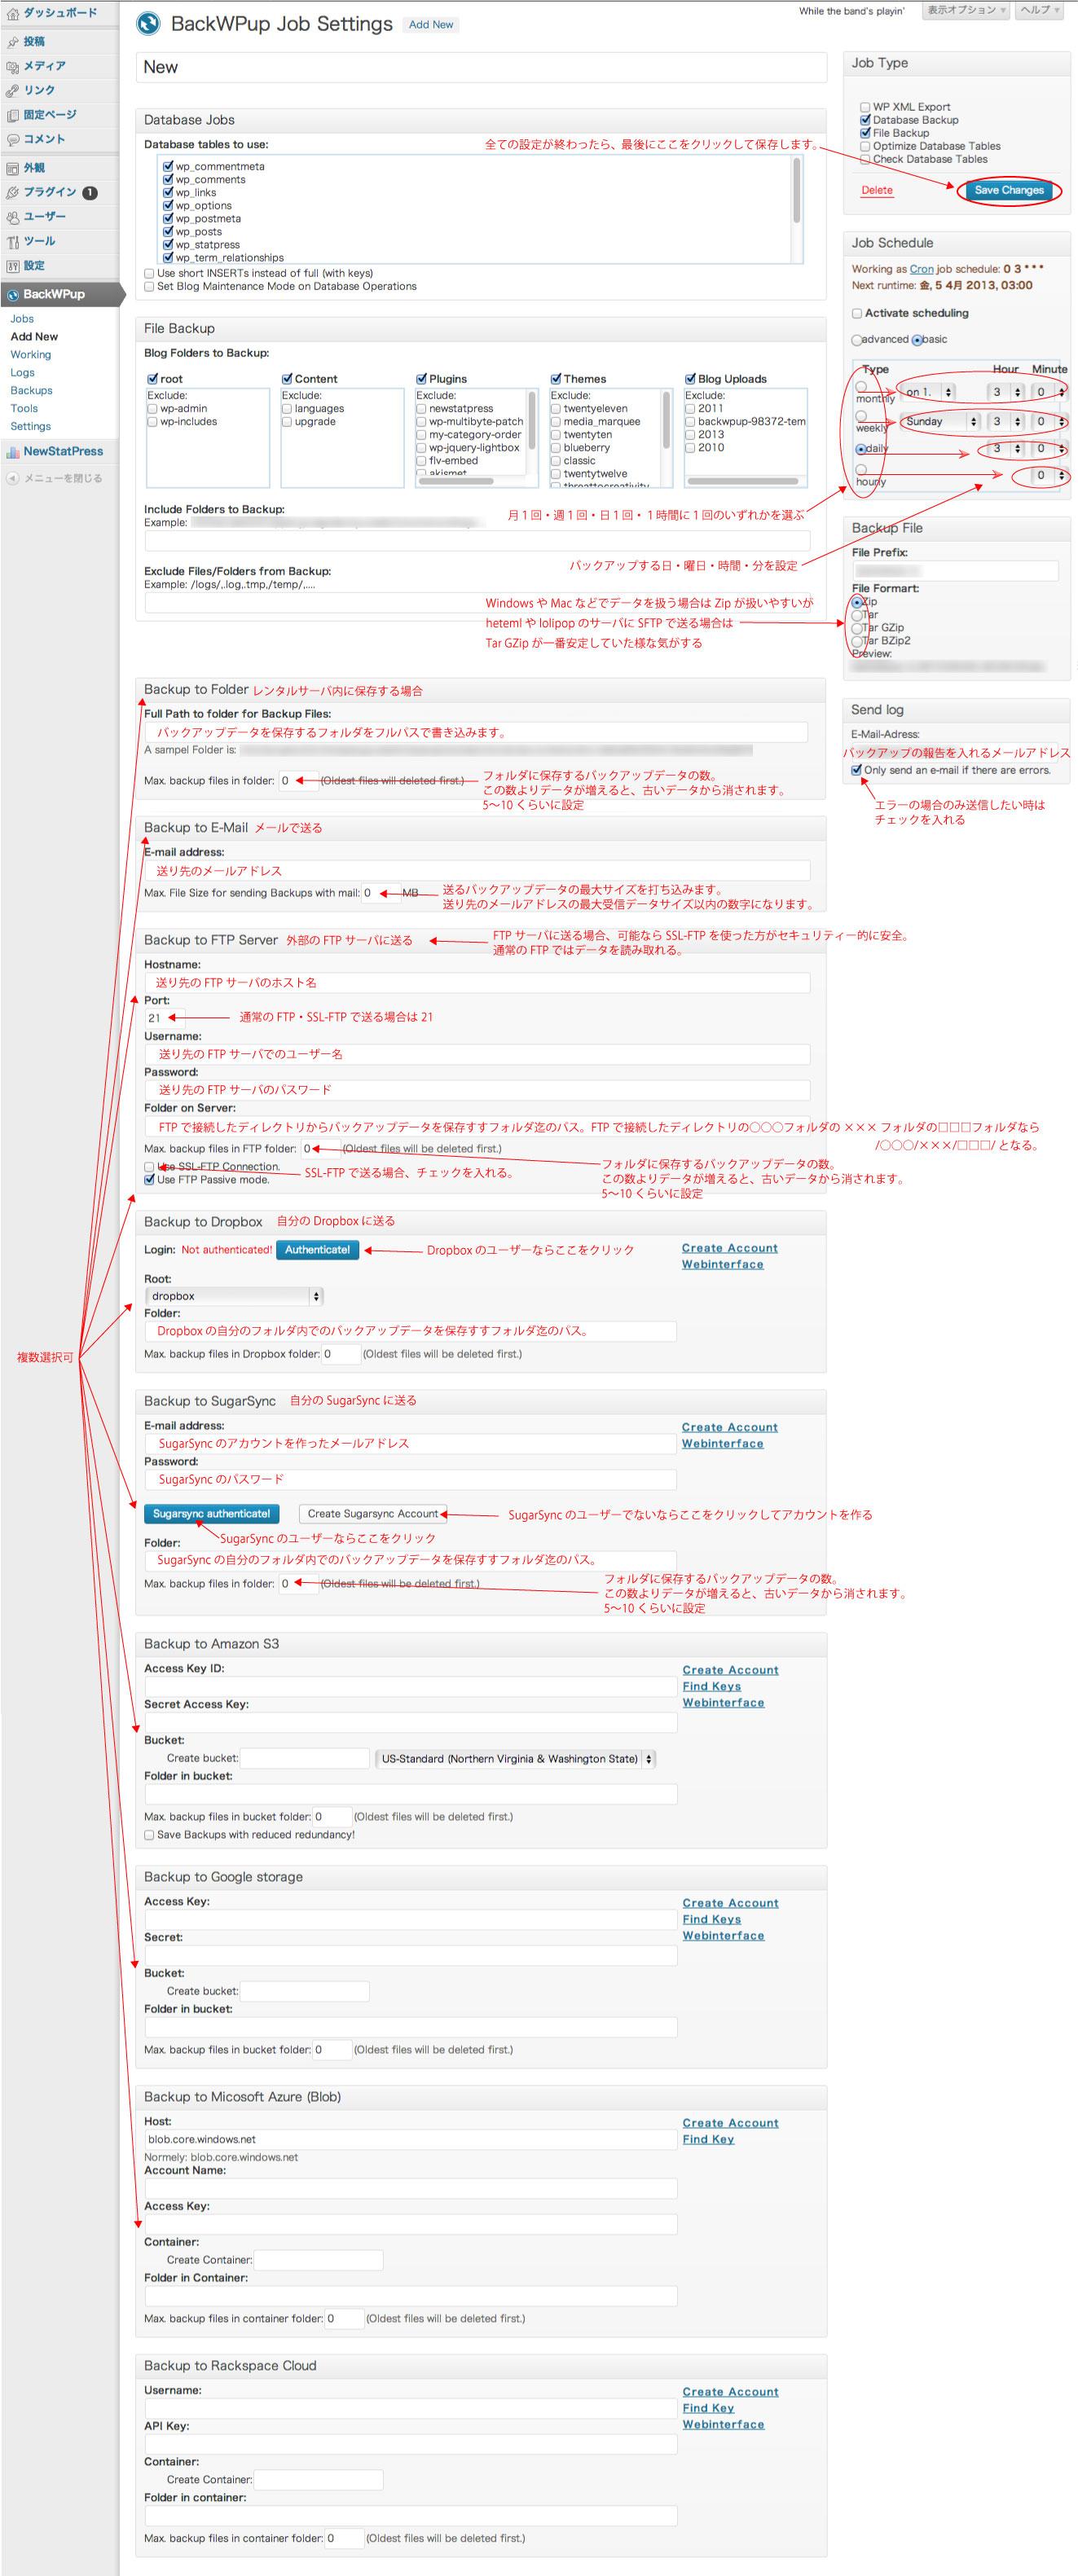 BackWPUpバージョン2のJobの設定方法